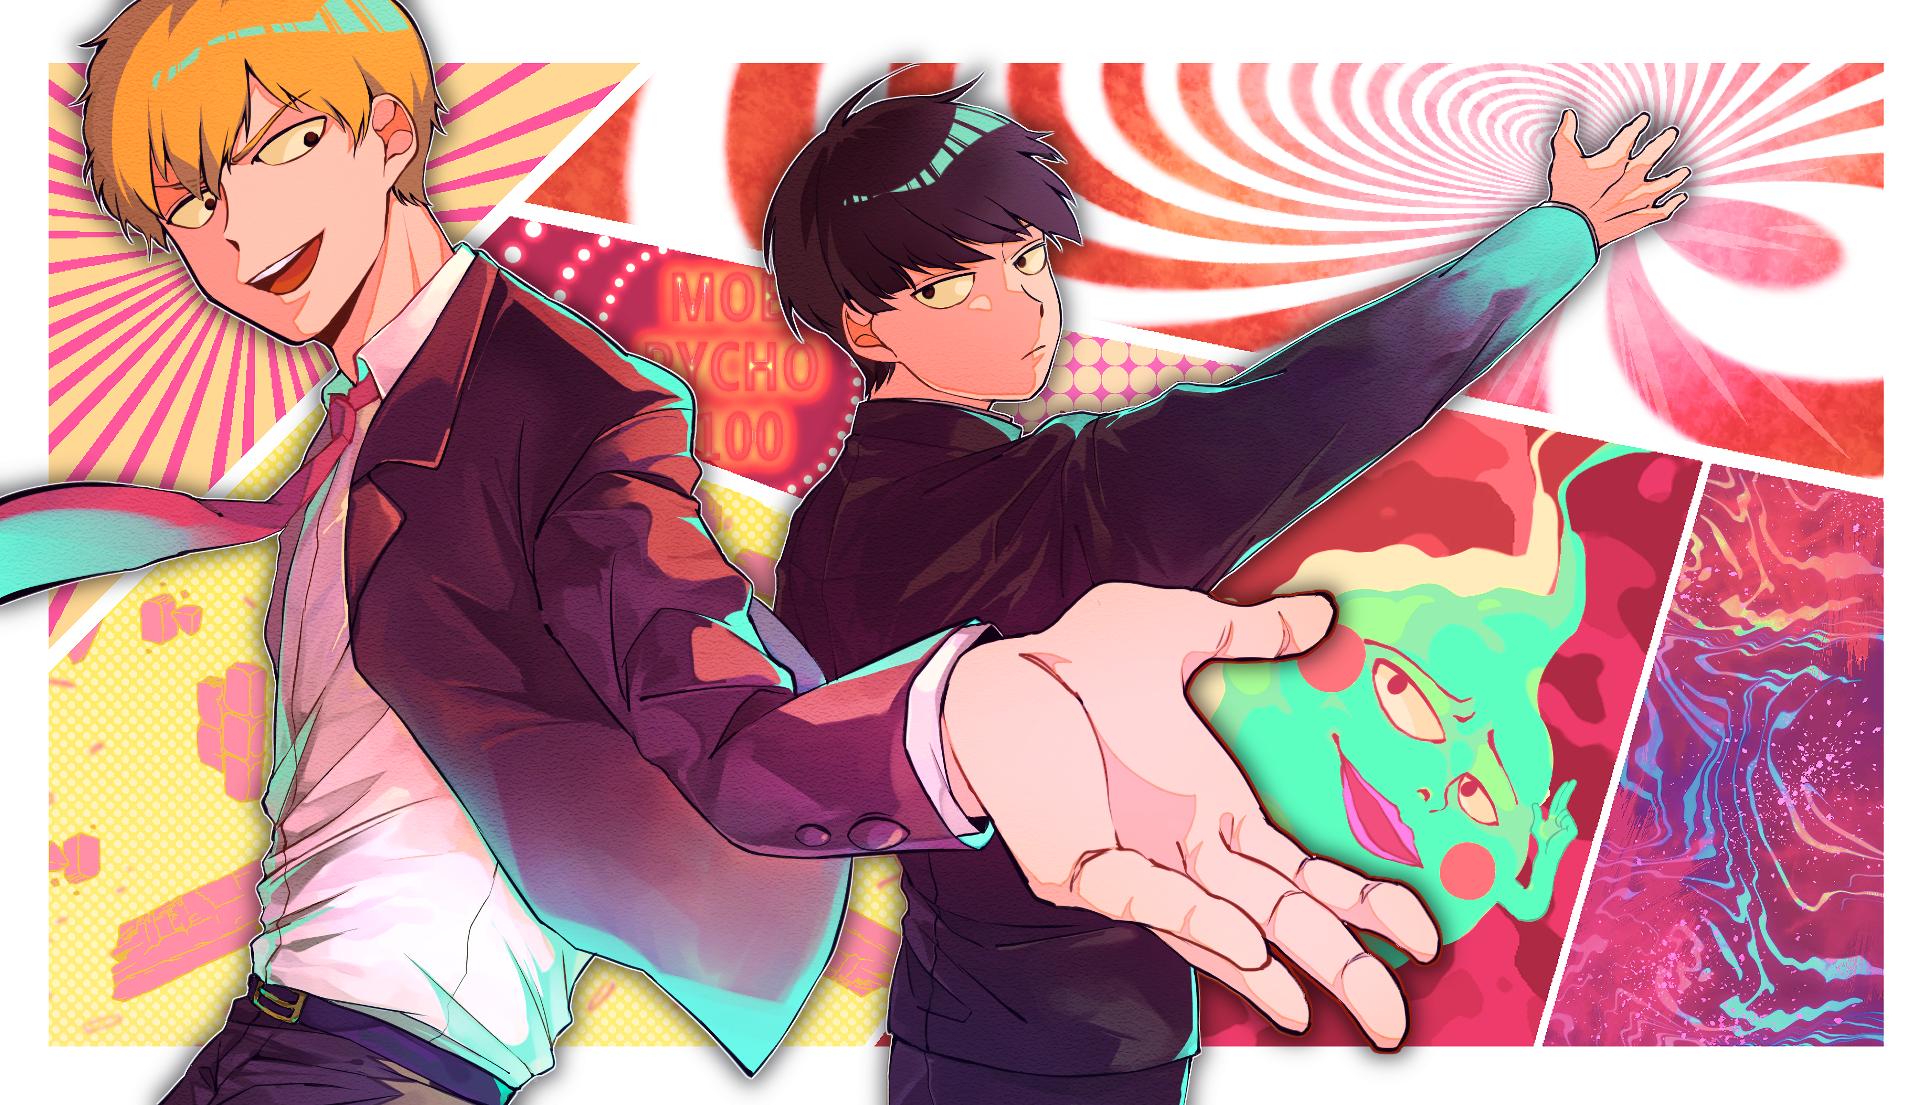 Wallpaper Illustration Anime Cartoon Comics Mob Psycho 100